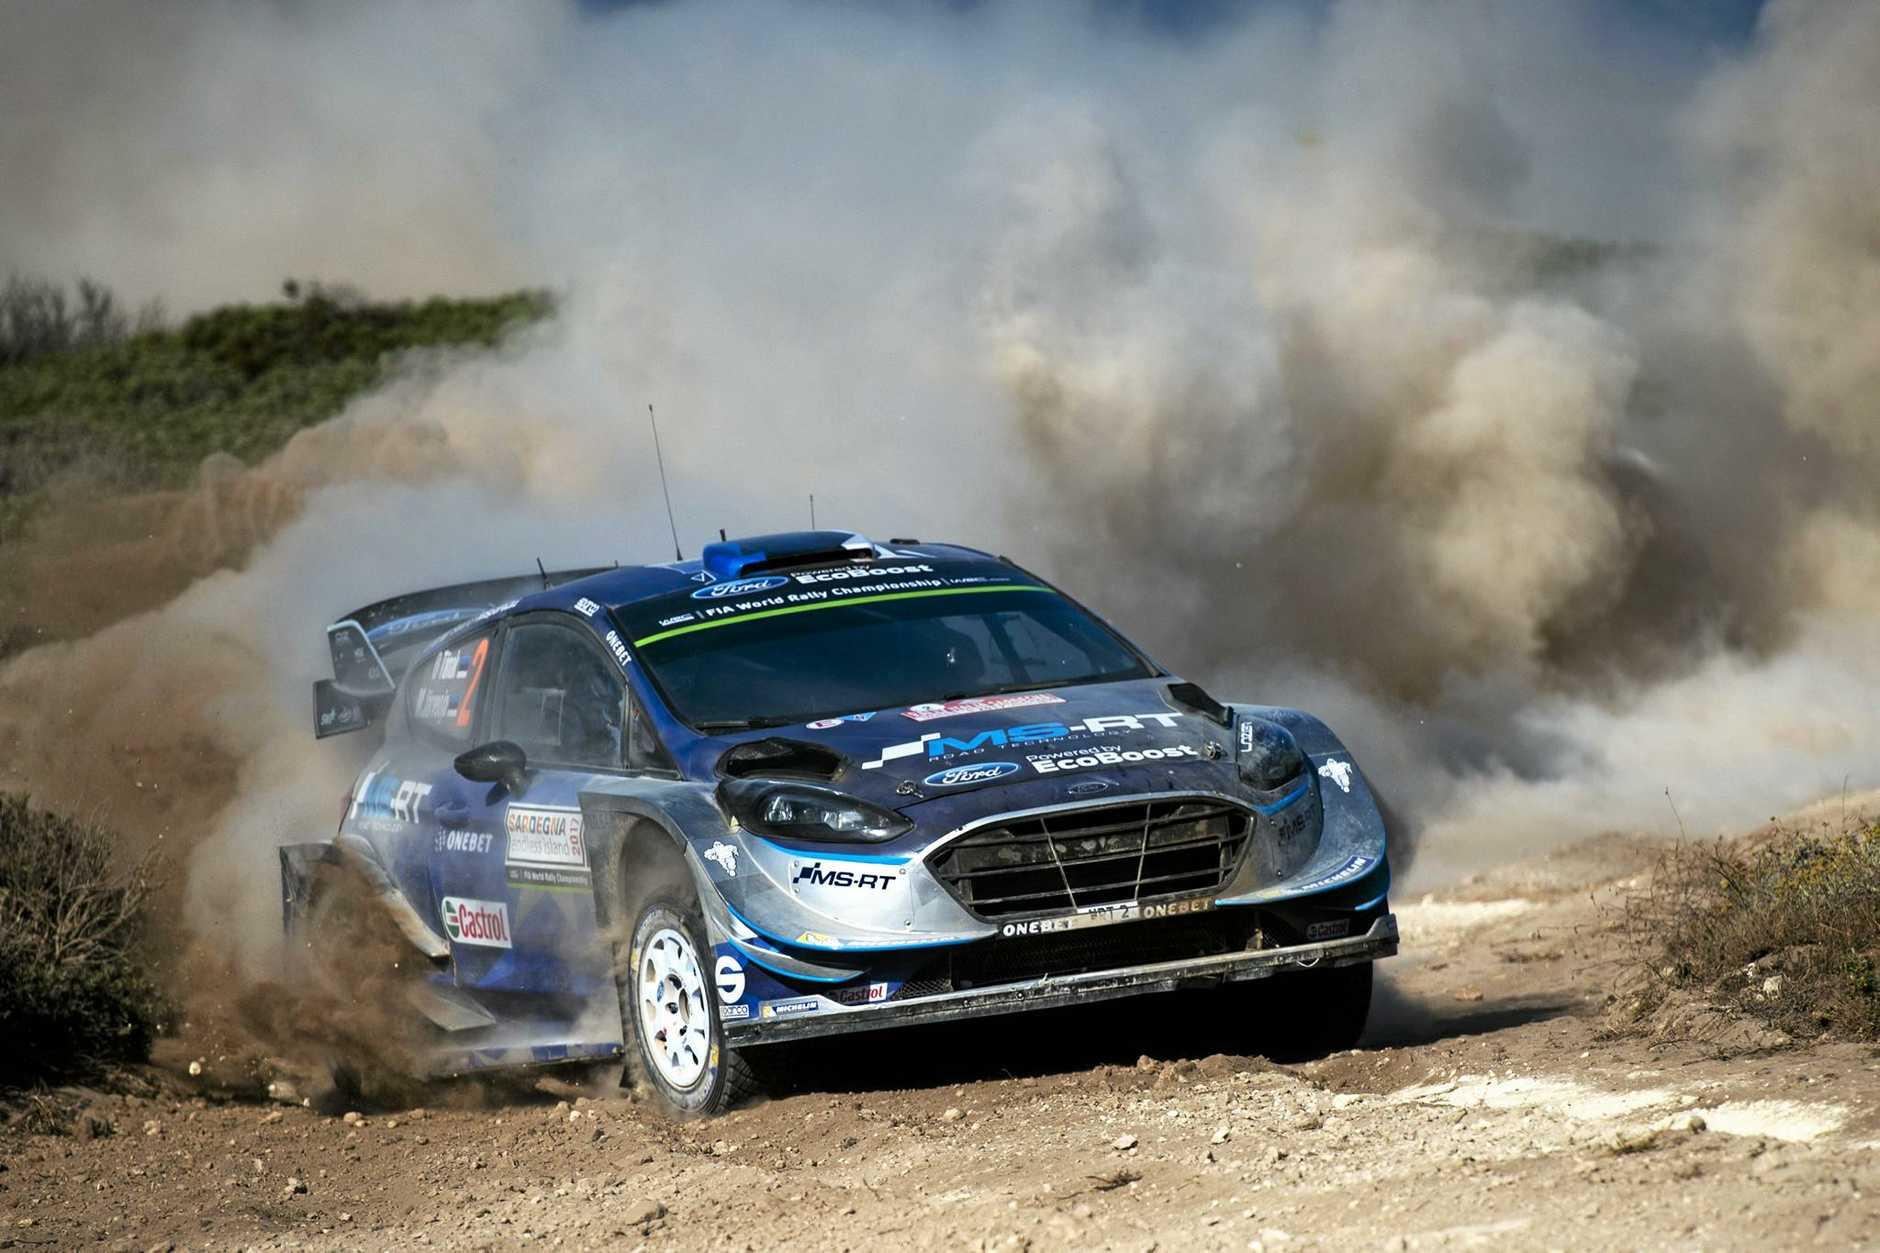 Ott Tänak survived dusty, rough conditions to win Rally Italia Sardegna.